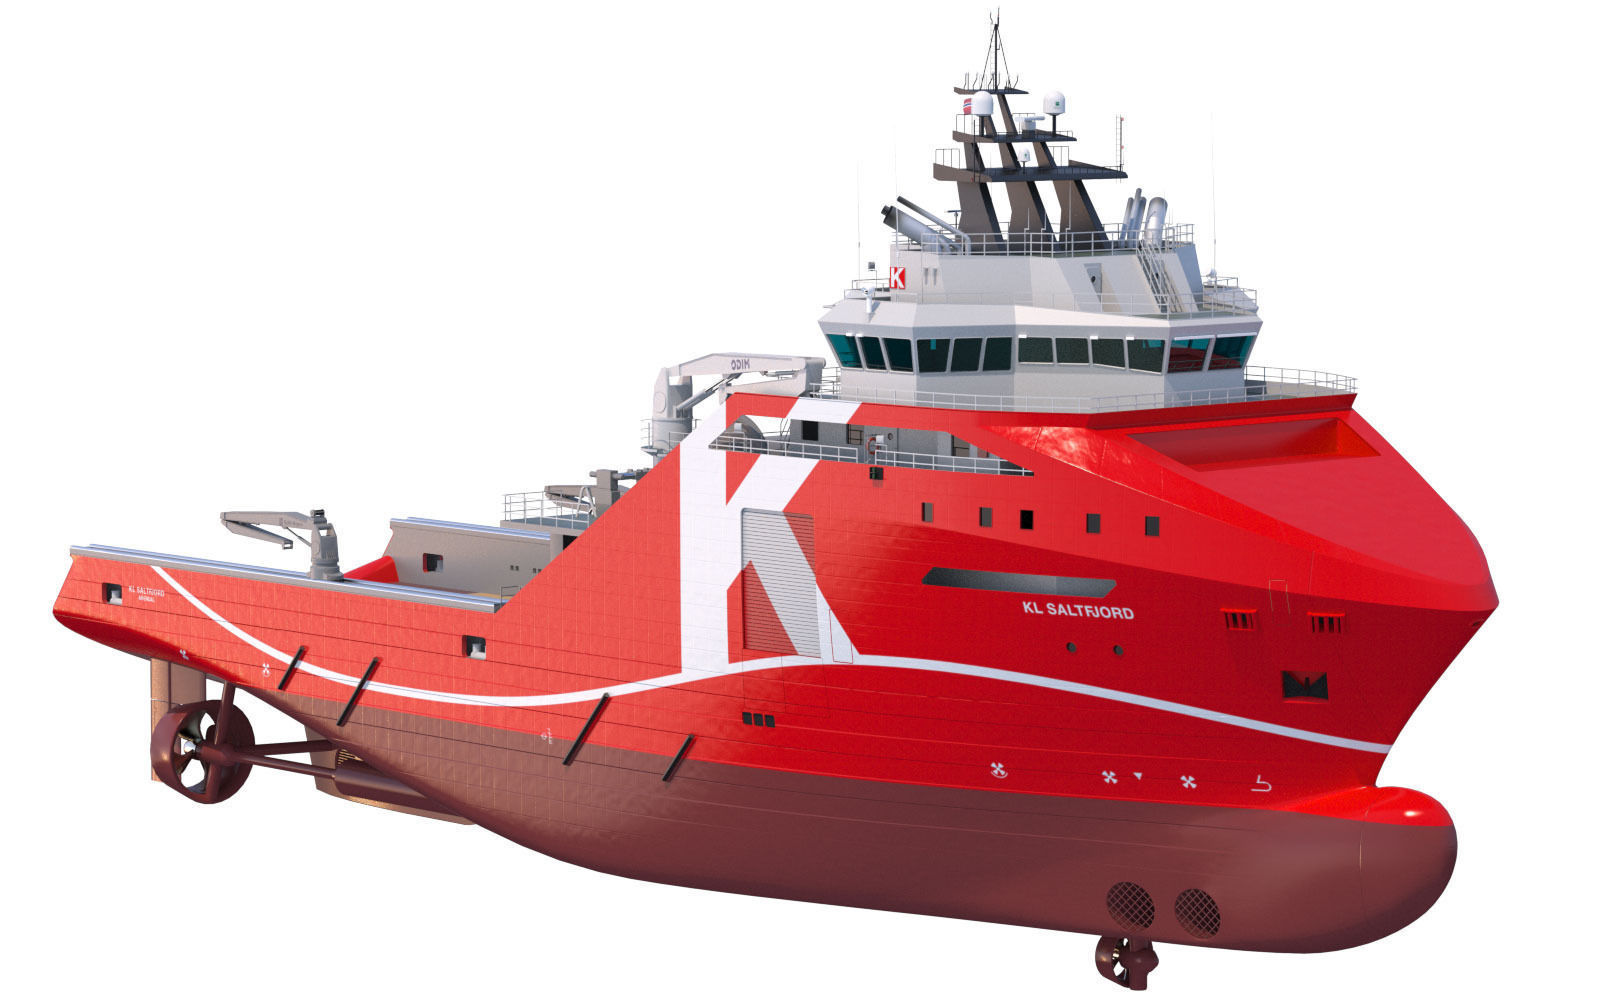 95 m AHTS Supply Vessel KL SALTFJORD